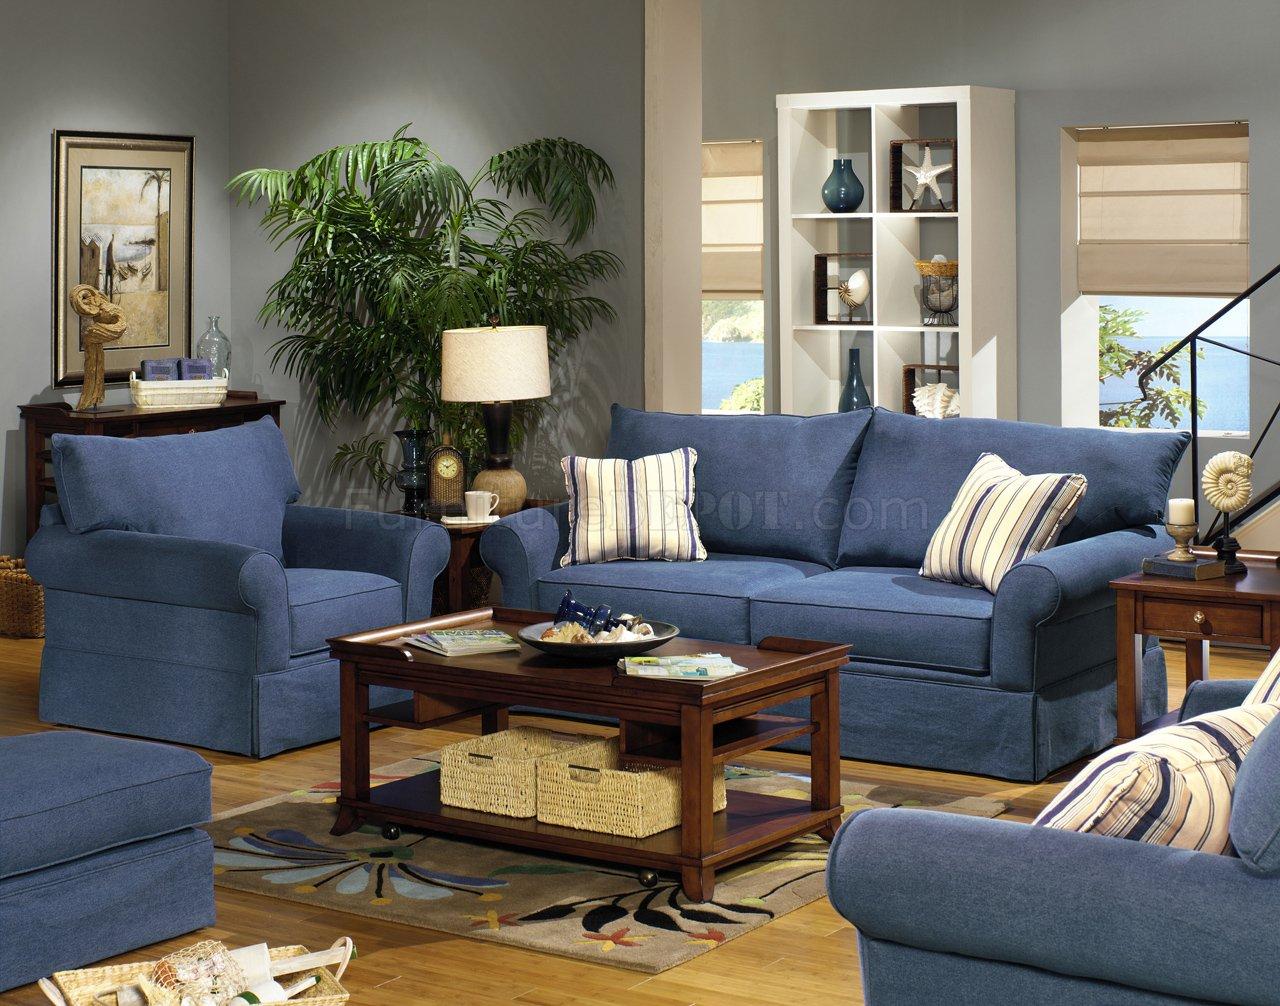 Picture of: Blue Denim Fabric Modern Sofa Loveseat Set W Options